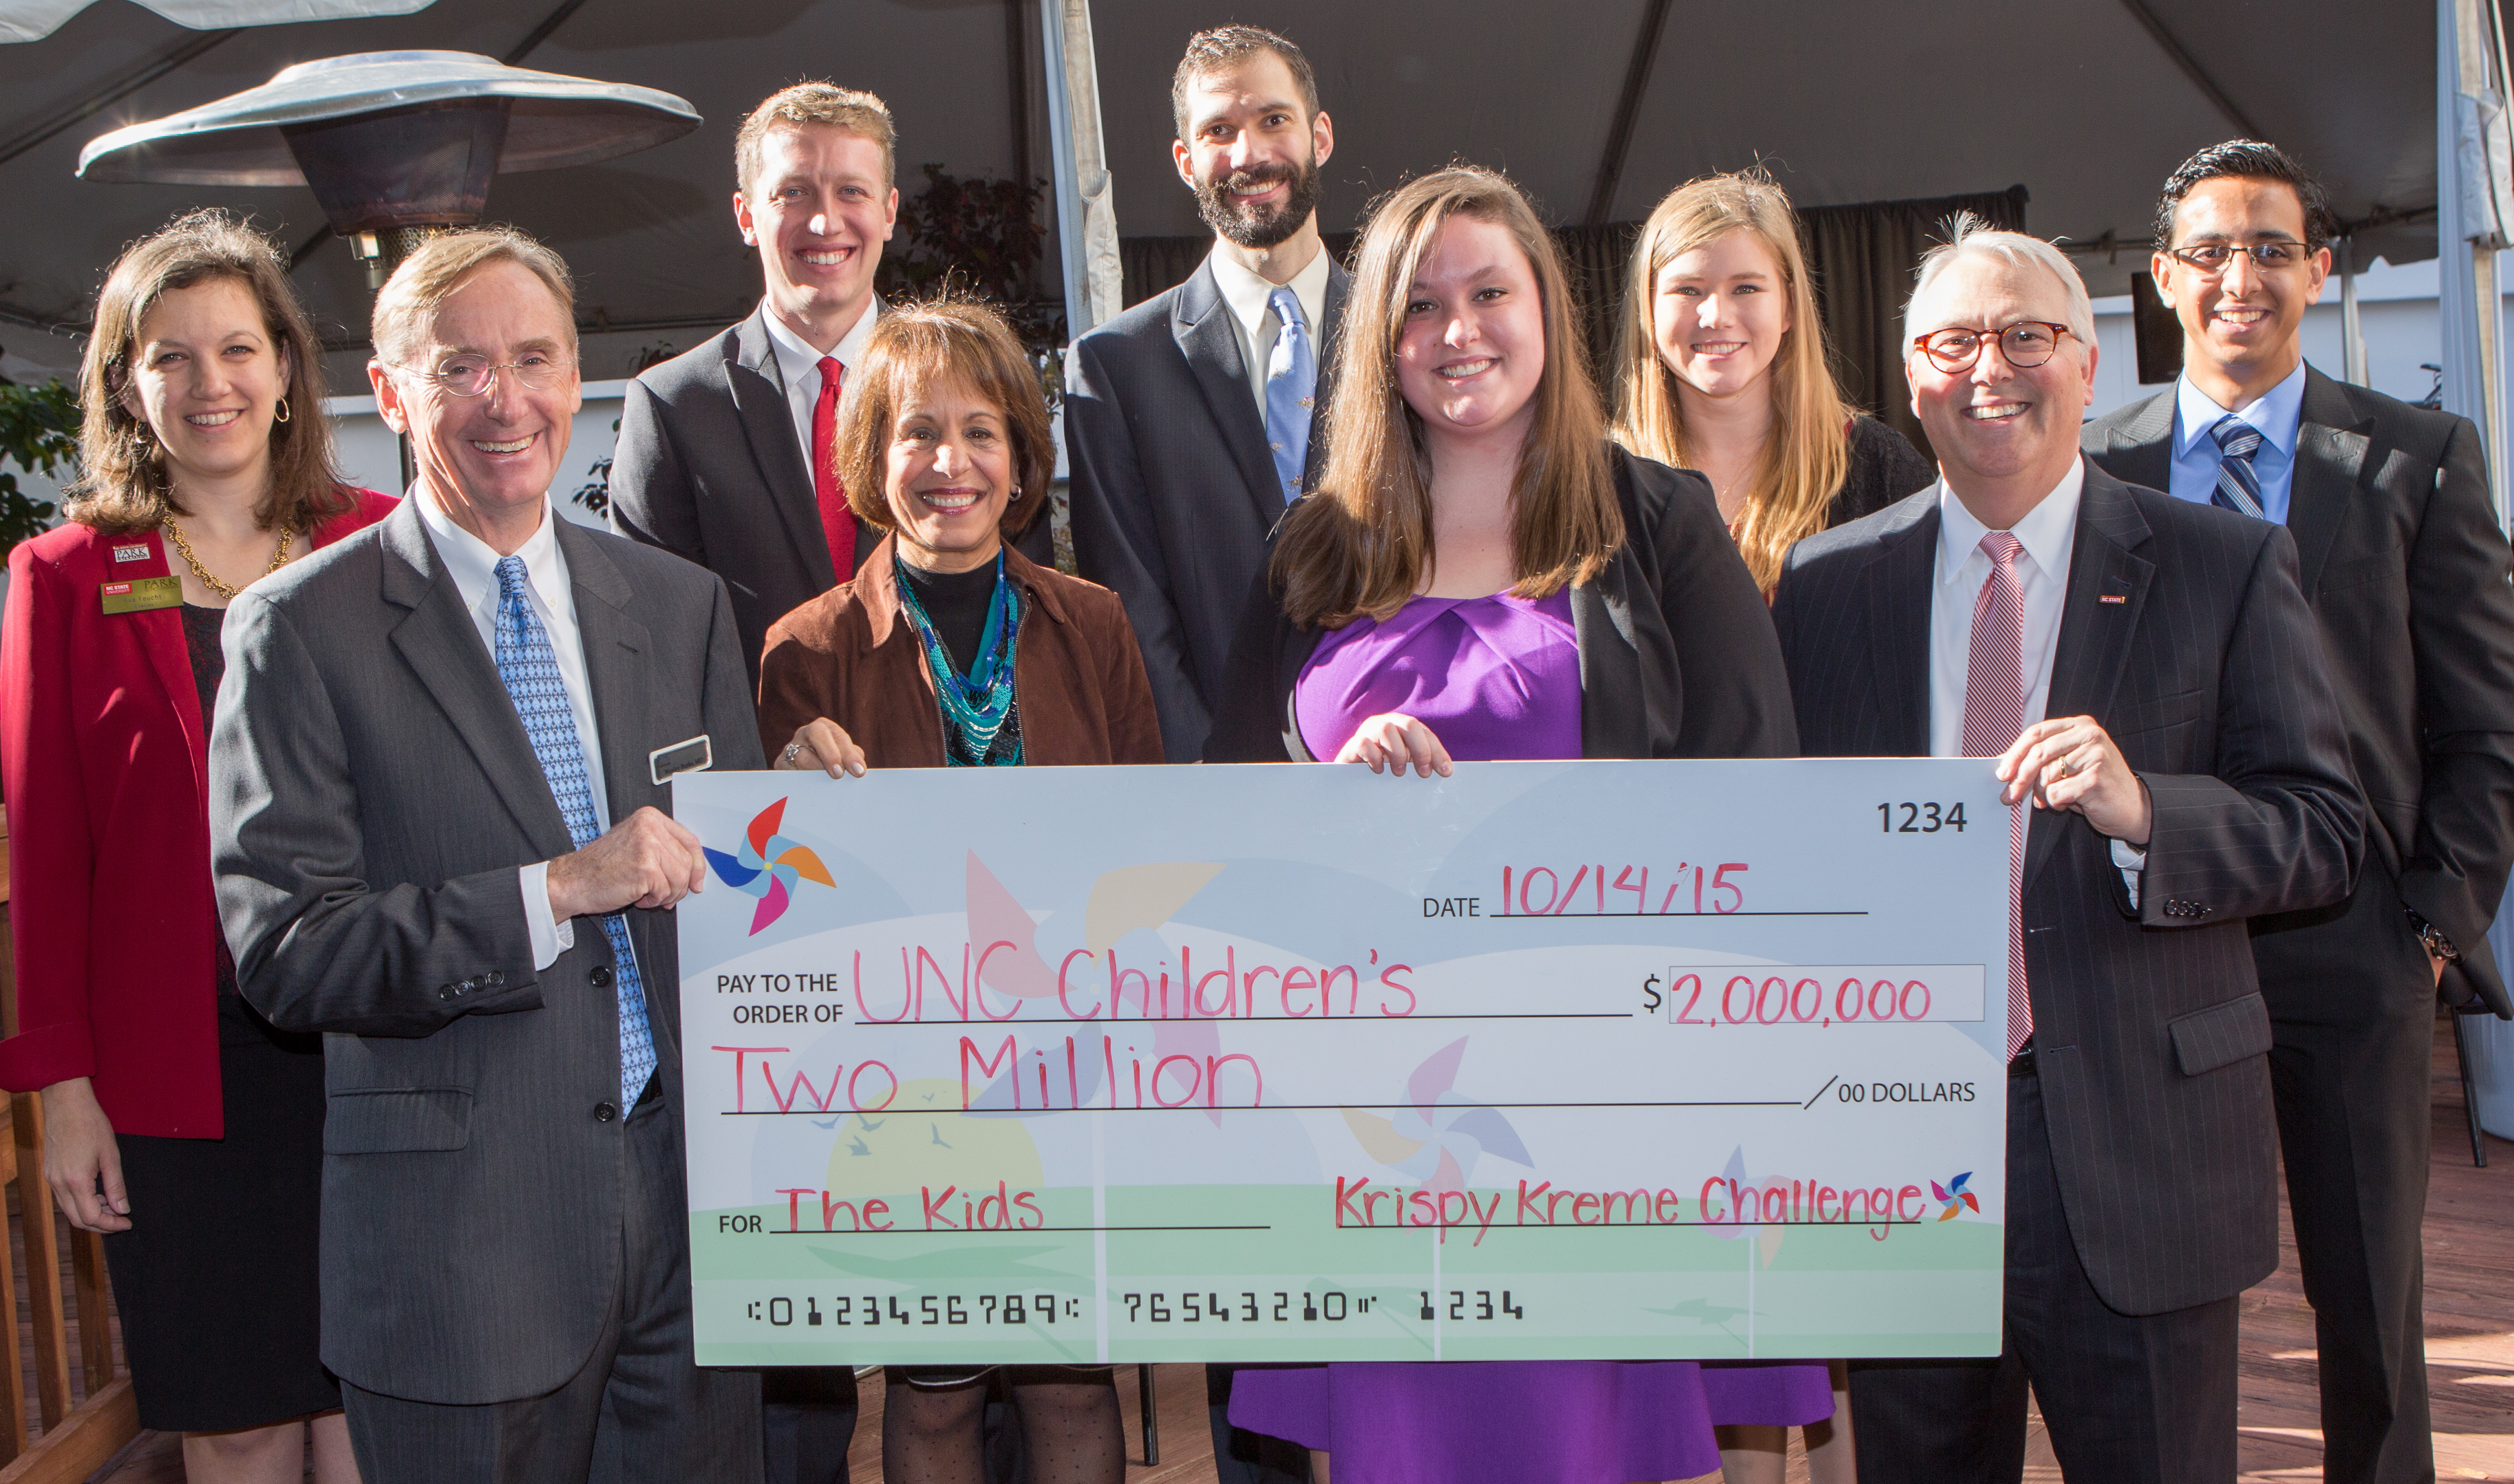 Krispy Kreme Challenge Check to UNC Children's